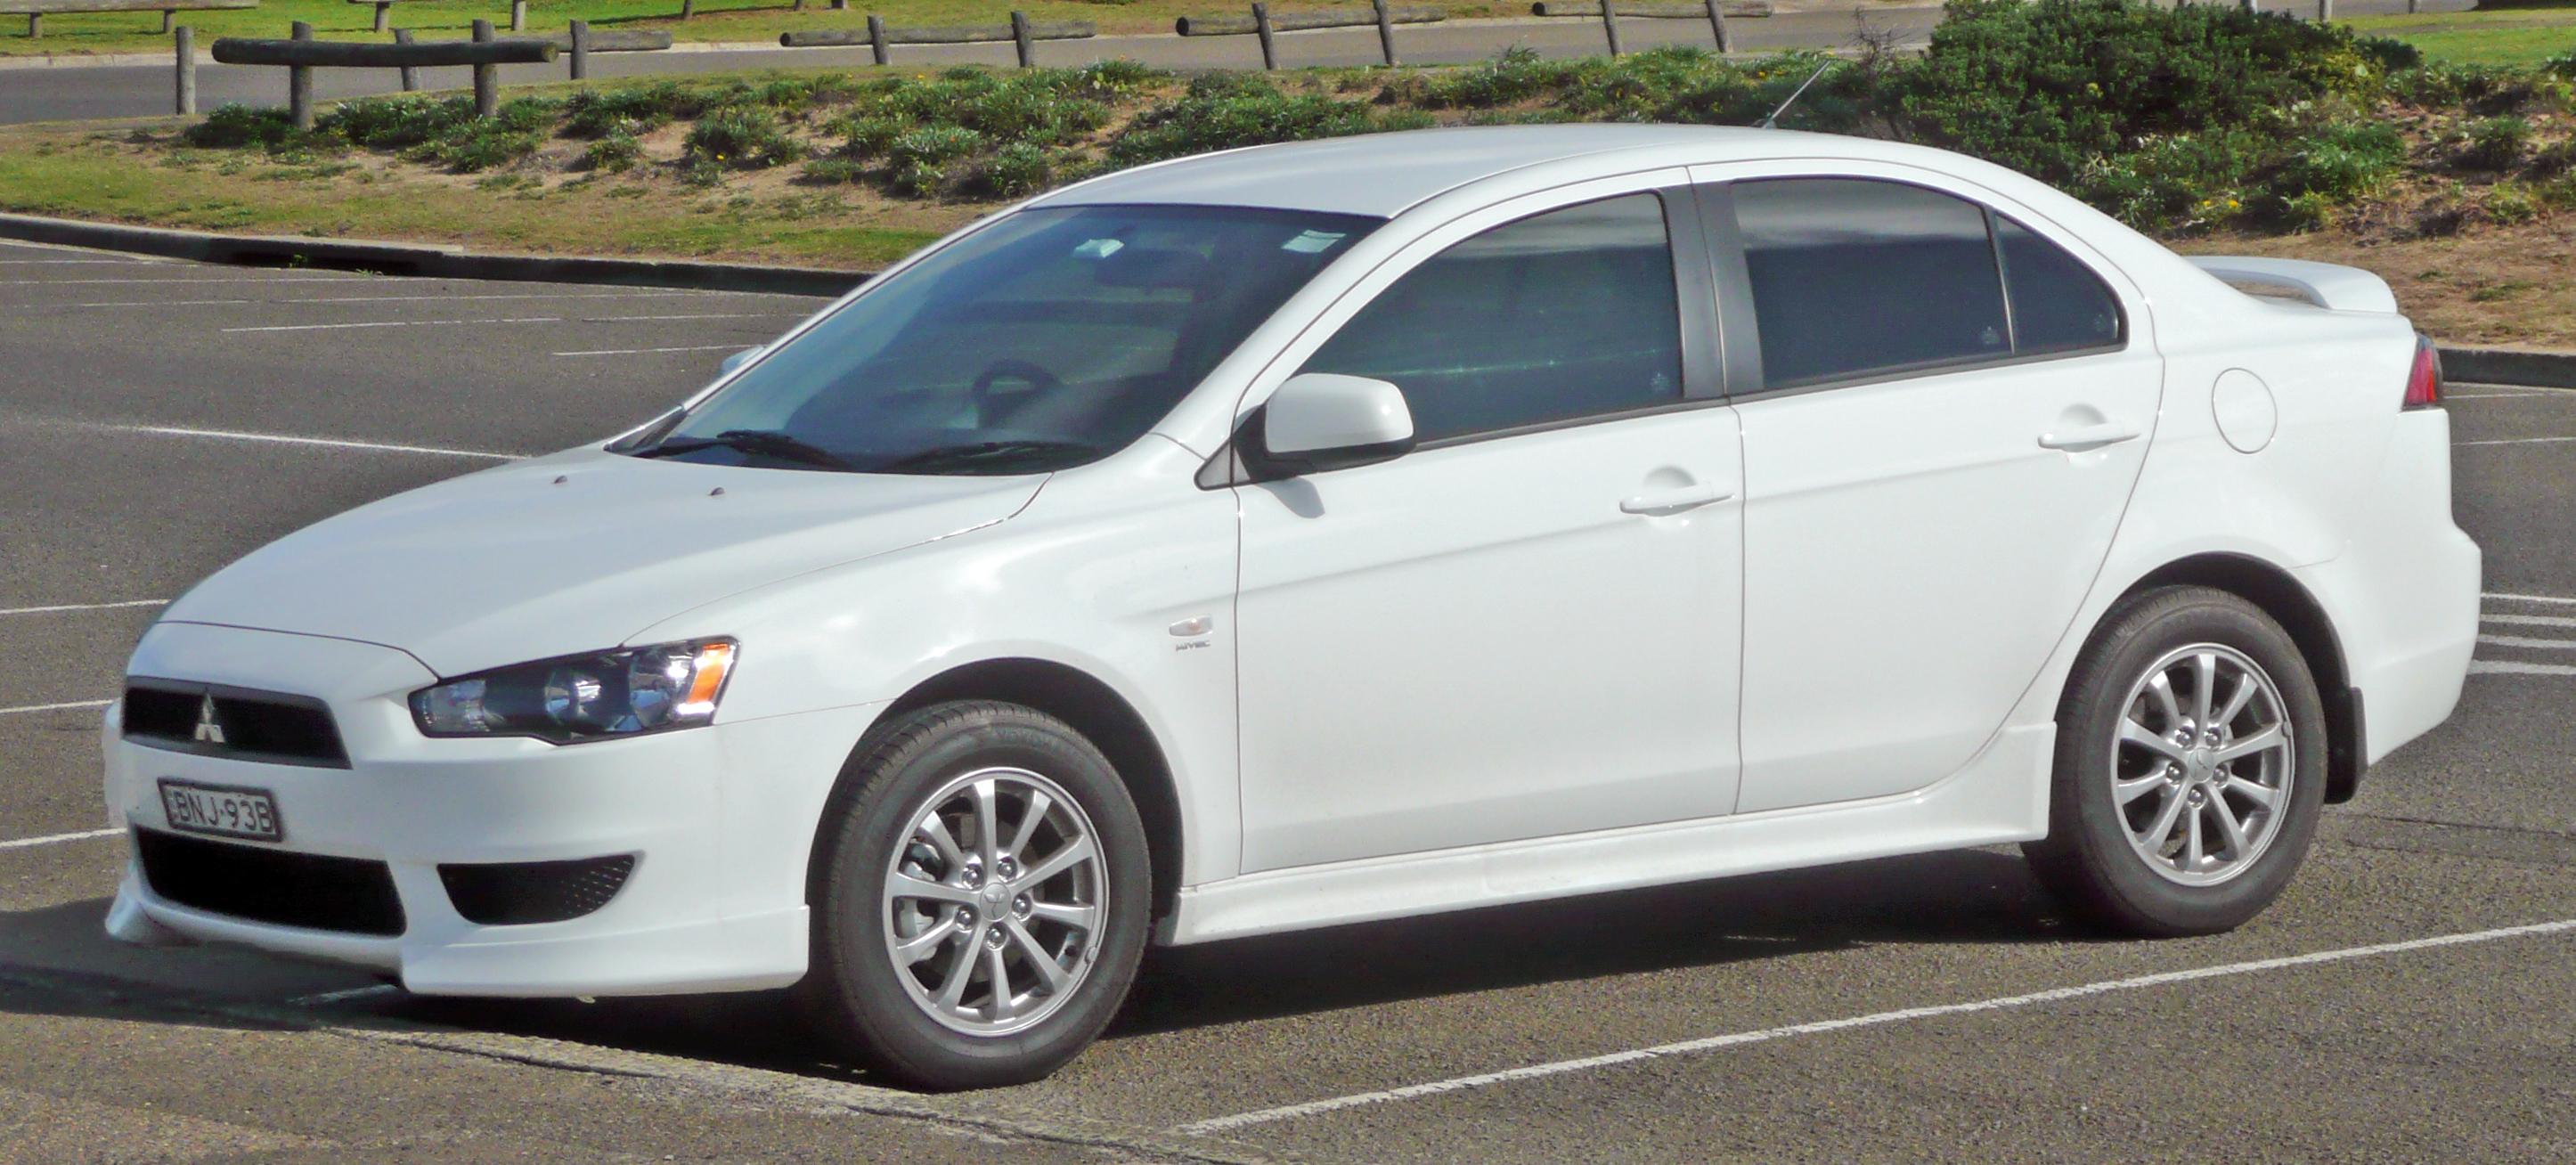 Lancer New Model Car